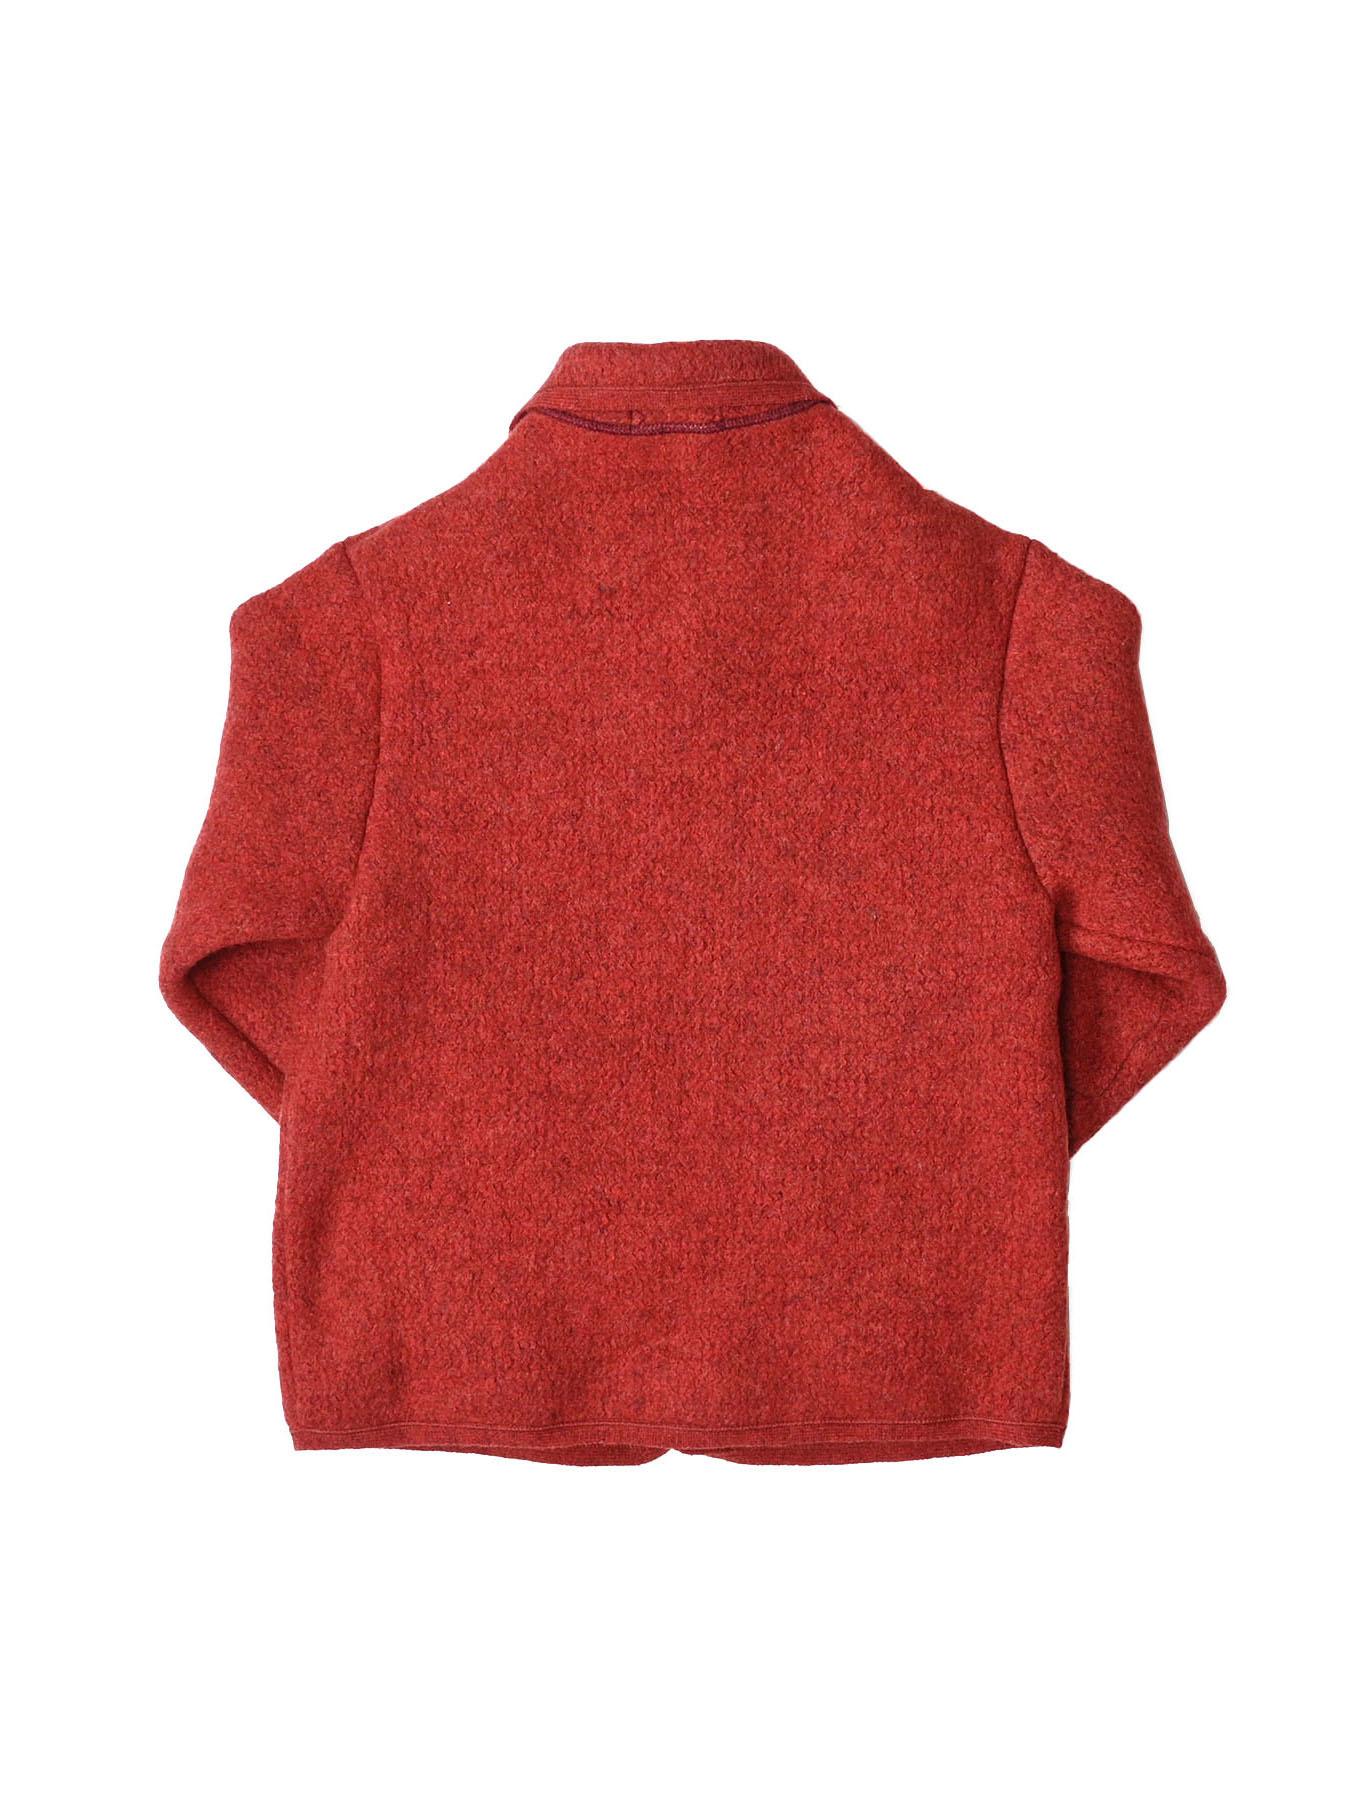 Cotton Shetland 908 Tyrolean Jacket-5